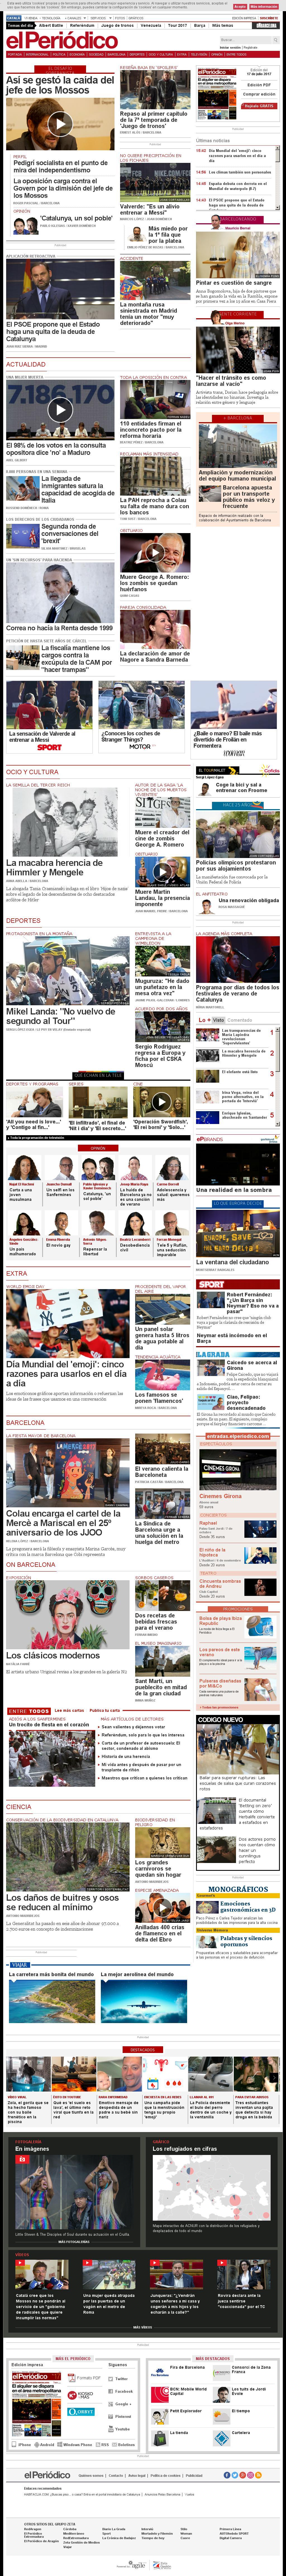 El Periodico at Monday July 17, 2017, 2:21 p.m. UTC